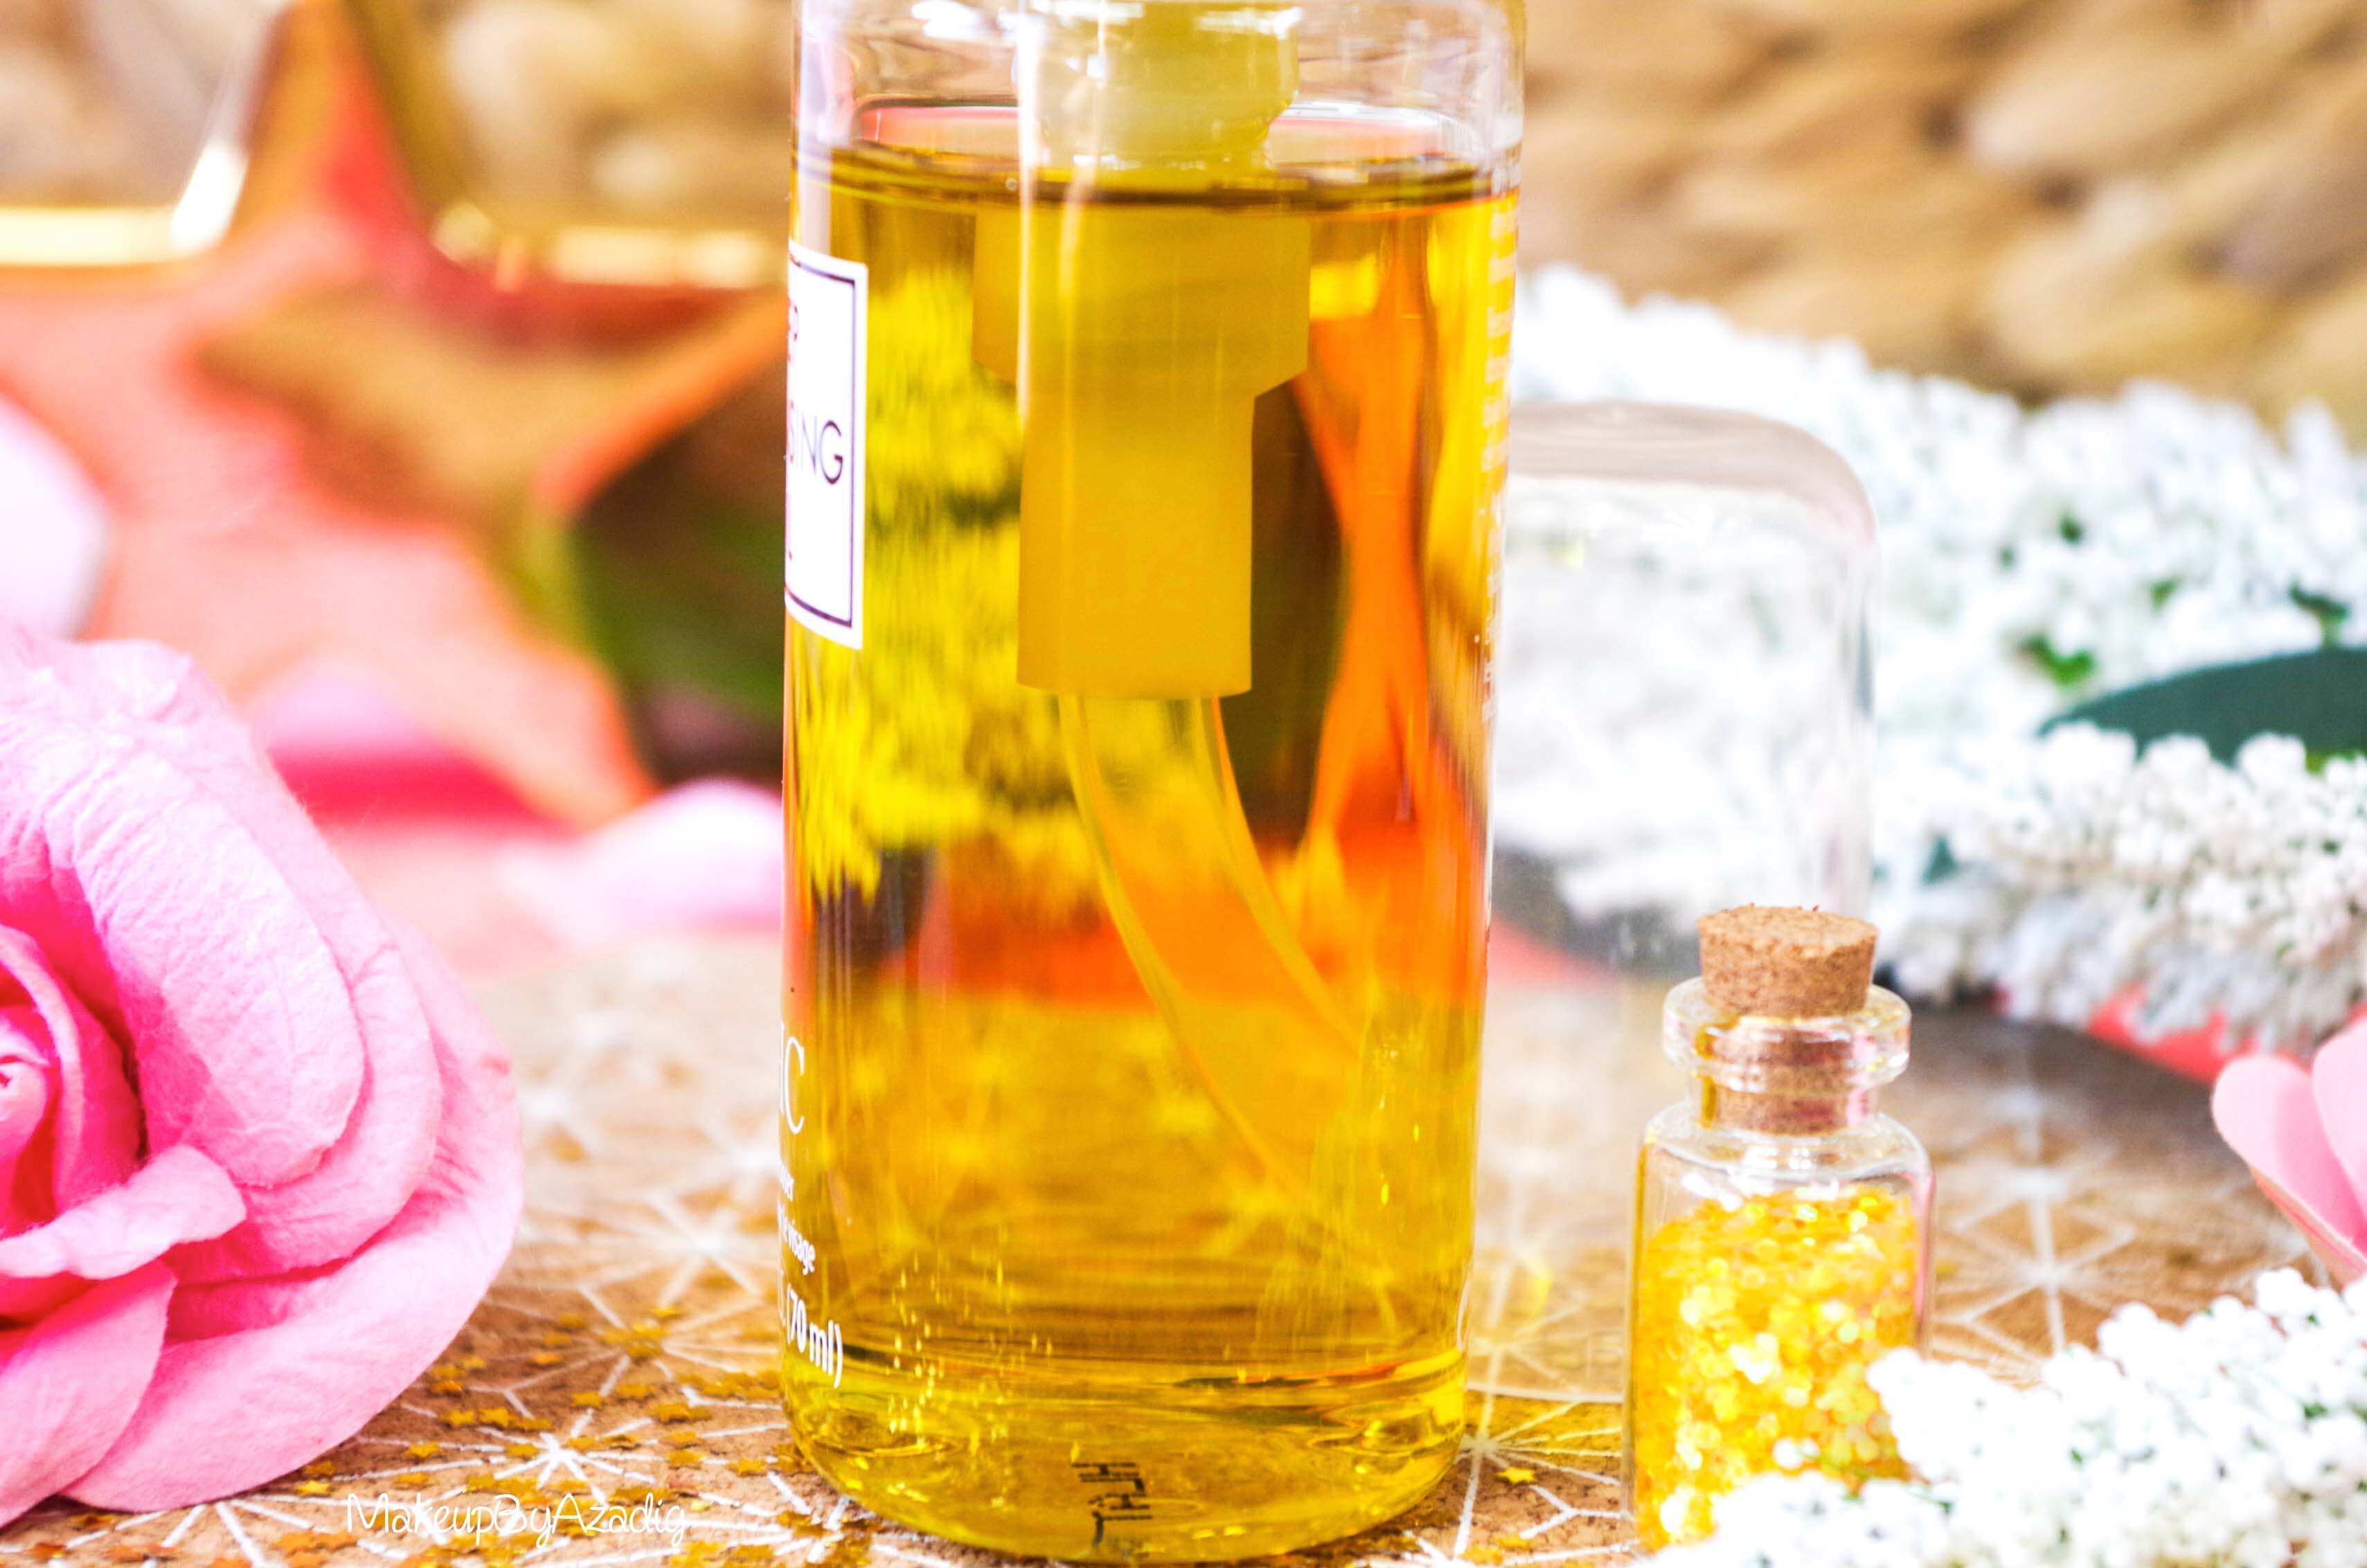 revue-review-huile-demaquillante-deep-cleansing-oil-dhc-meilleure-avis-prix-nocibe-monoprix-makeupbyazadig-olive